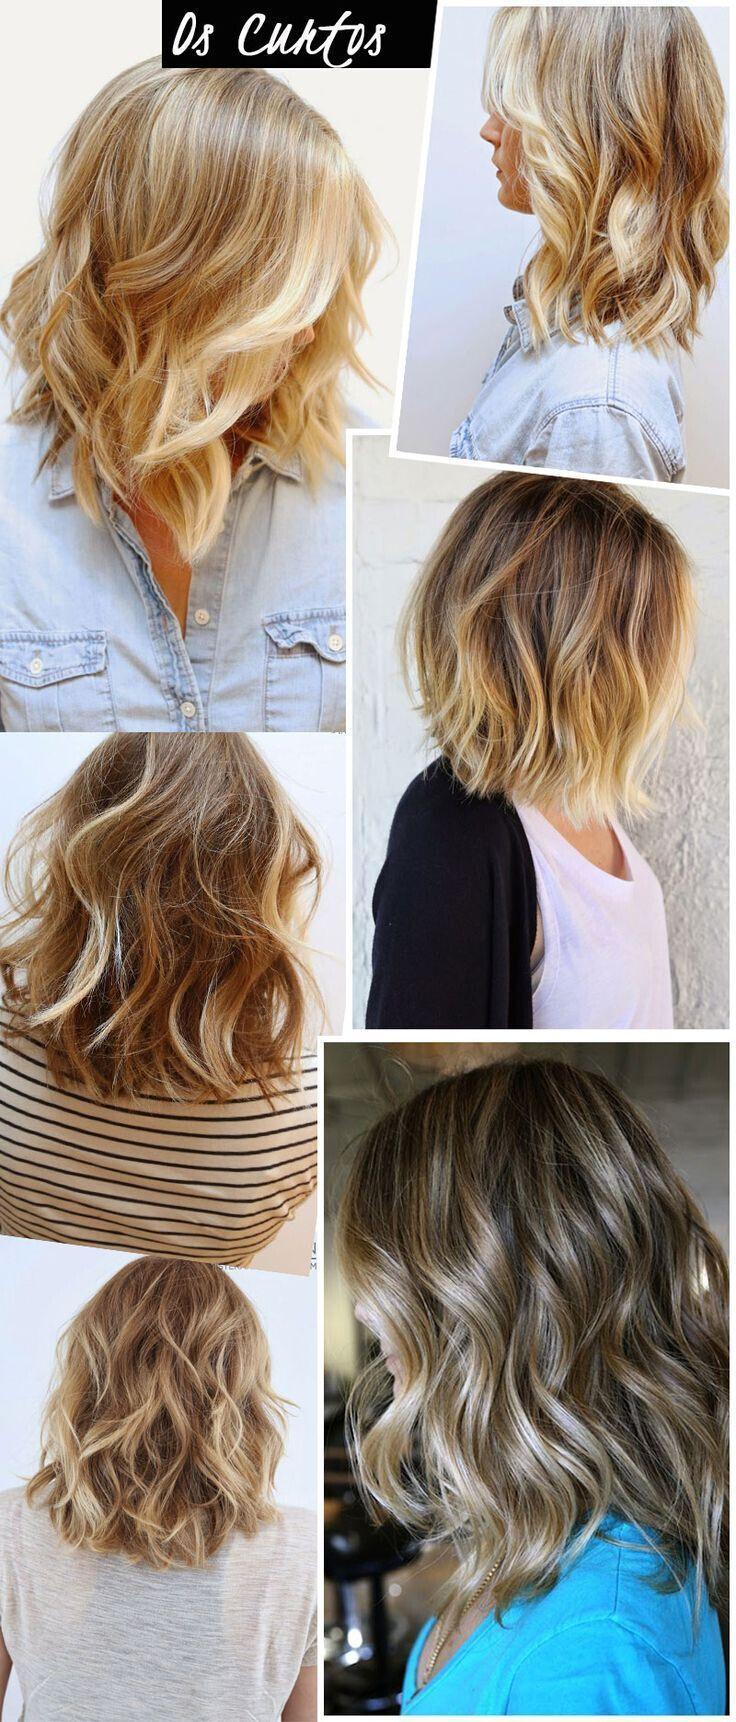 15 Pretty Hairstyles for Medium Length Hair